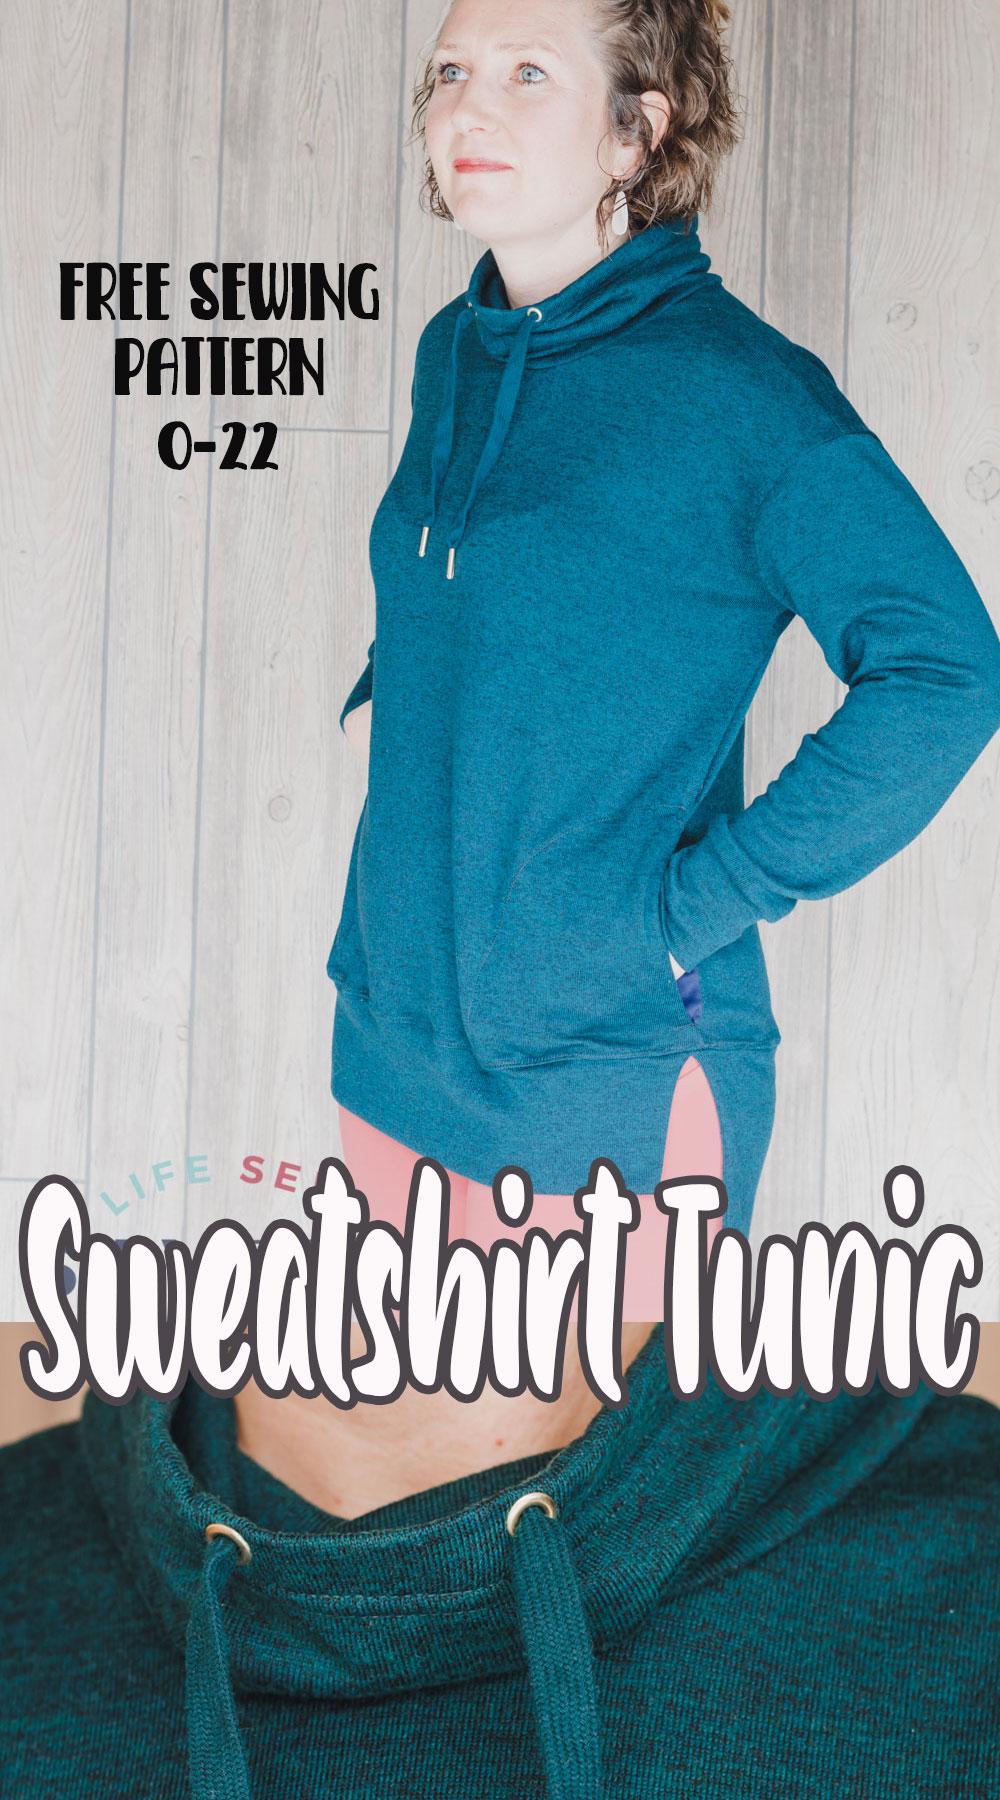 sweatshirt tunic free sewing pattern for women